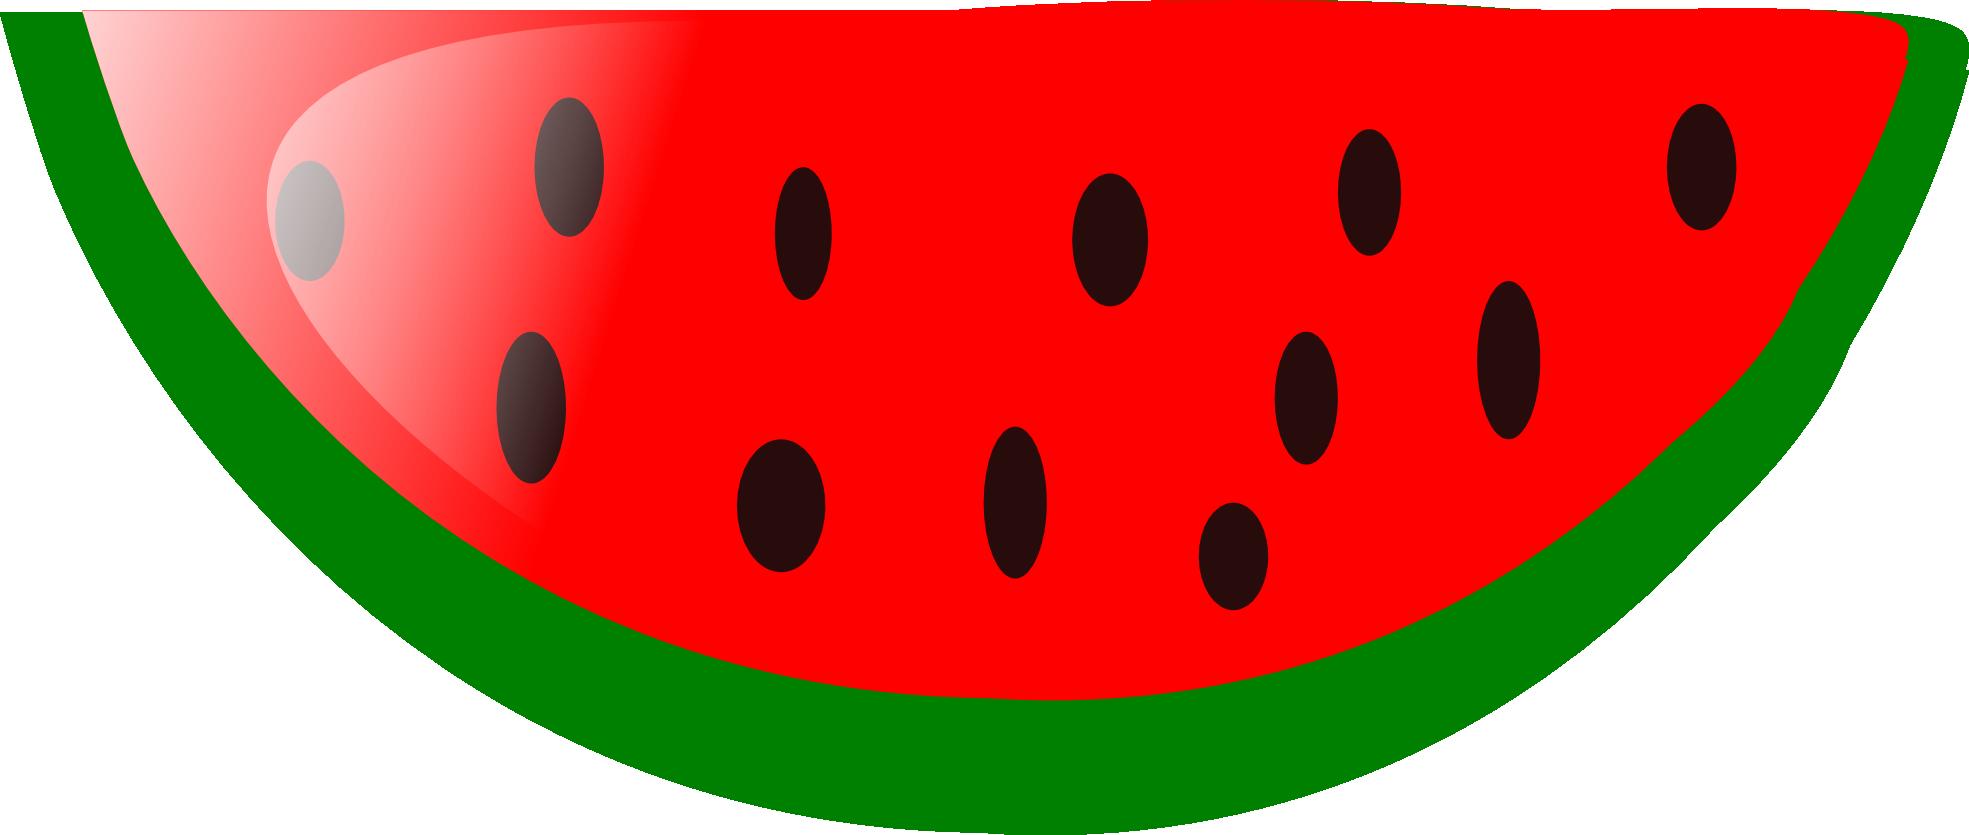 Watermelon clipart small watermelon. Seedless slice